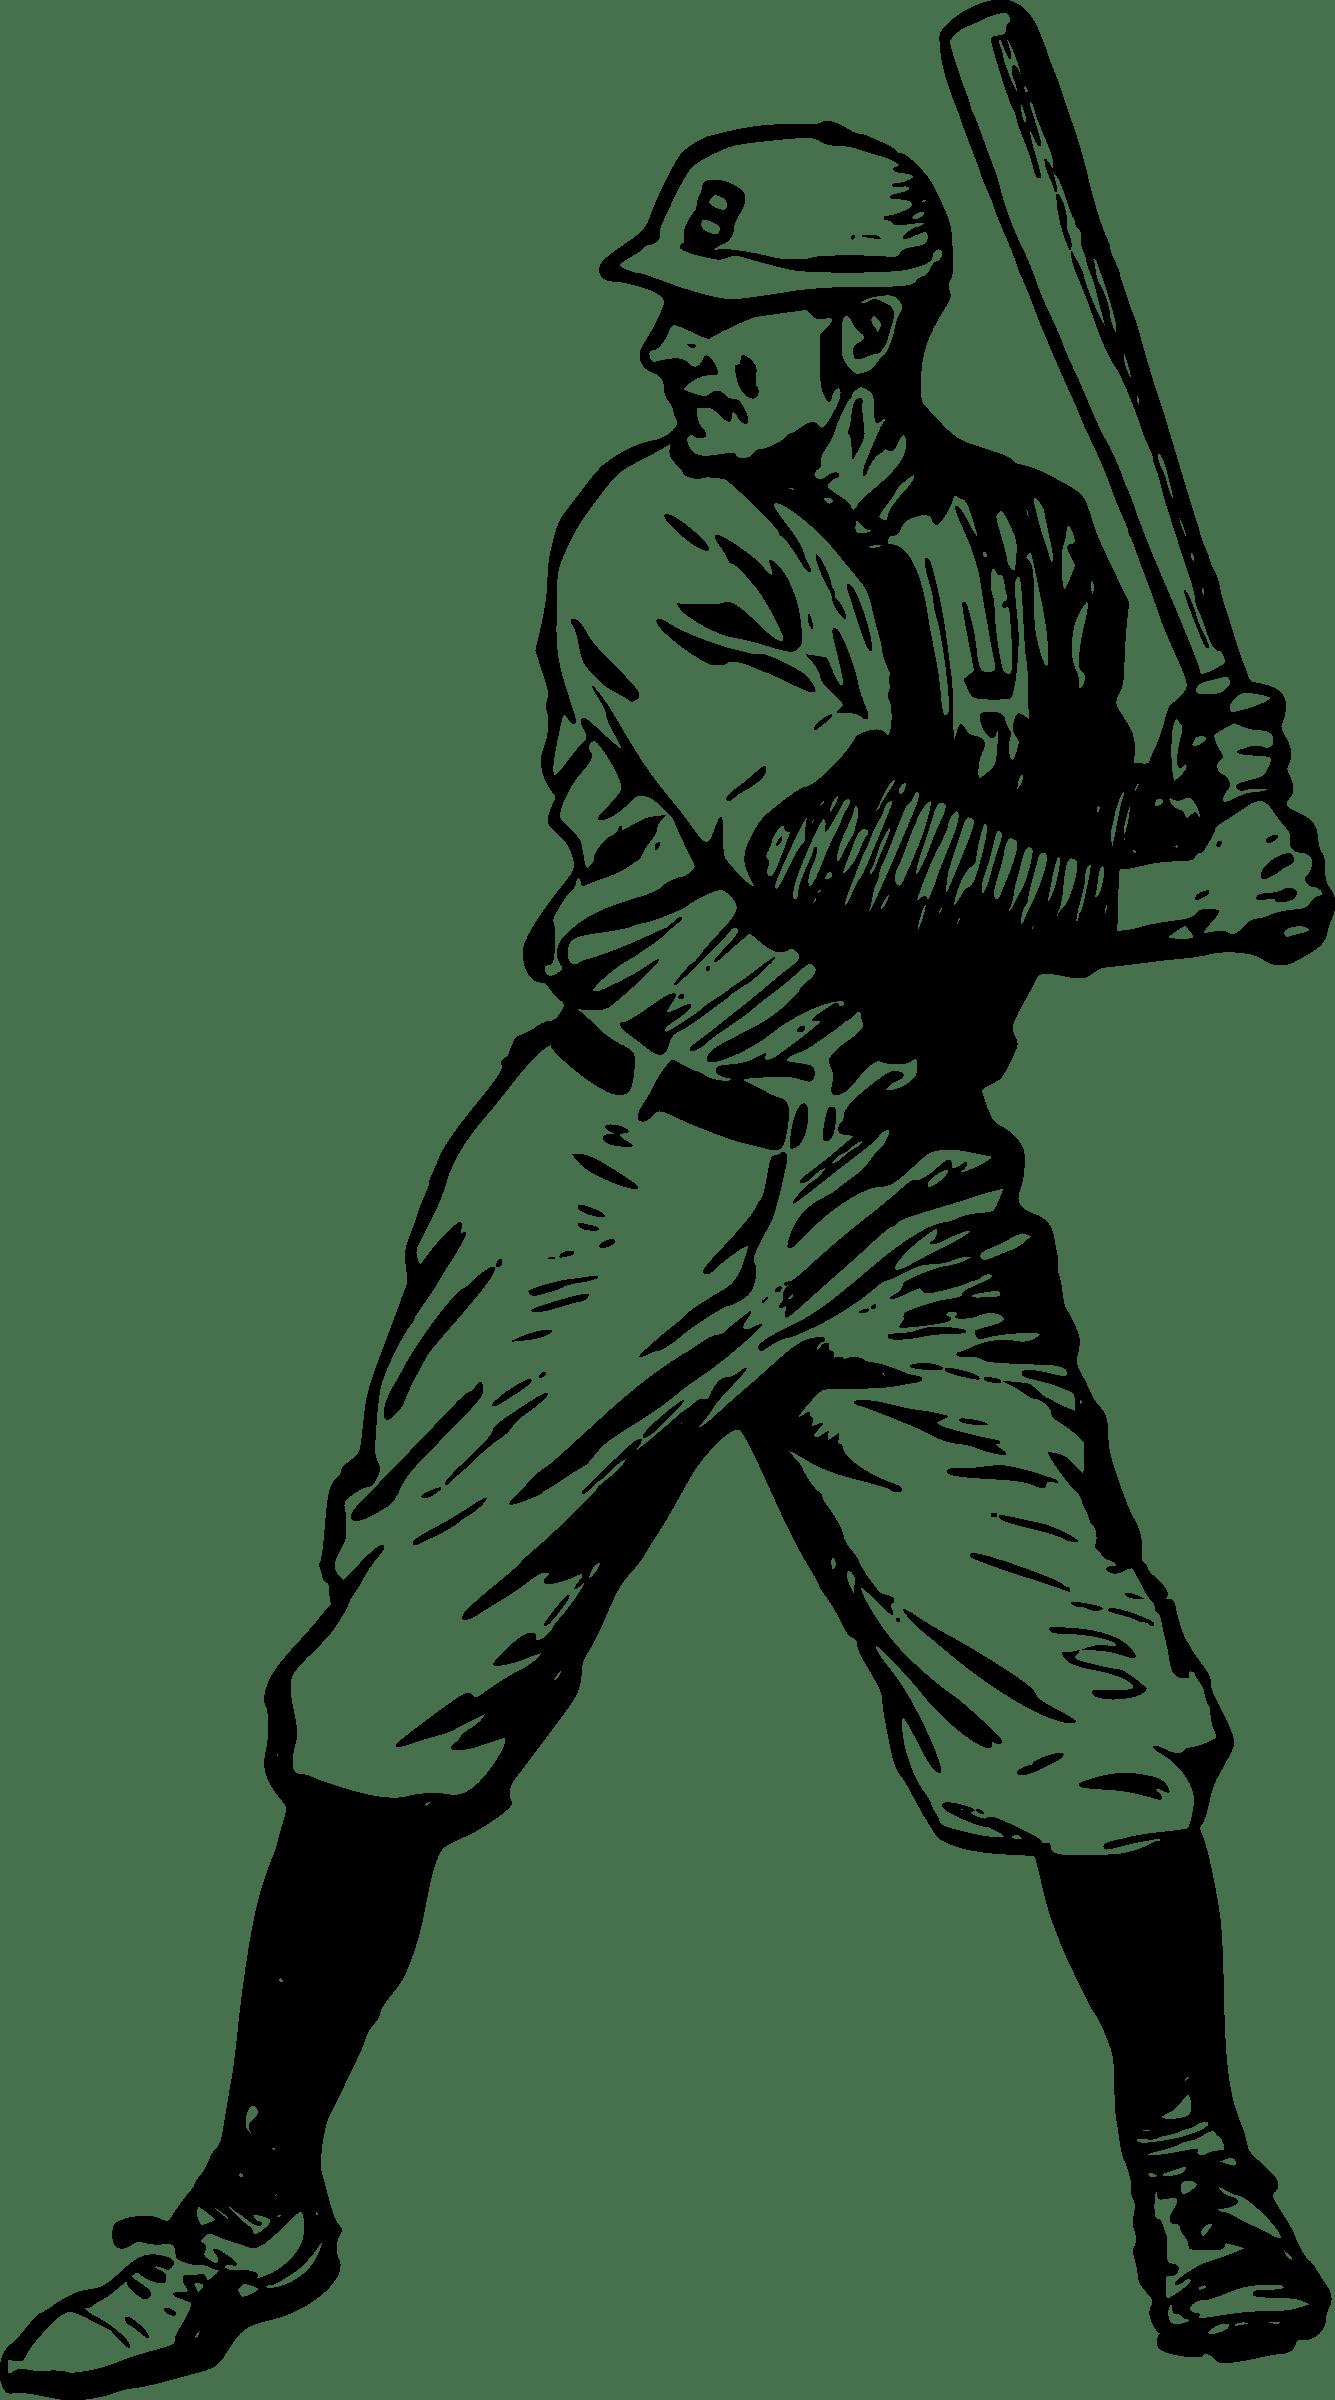 Batter at getdrawings com. Clipart baseball drawing